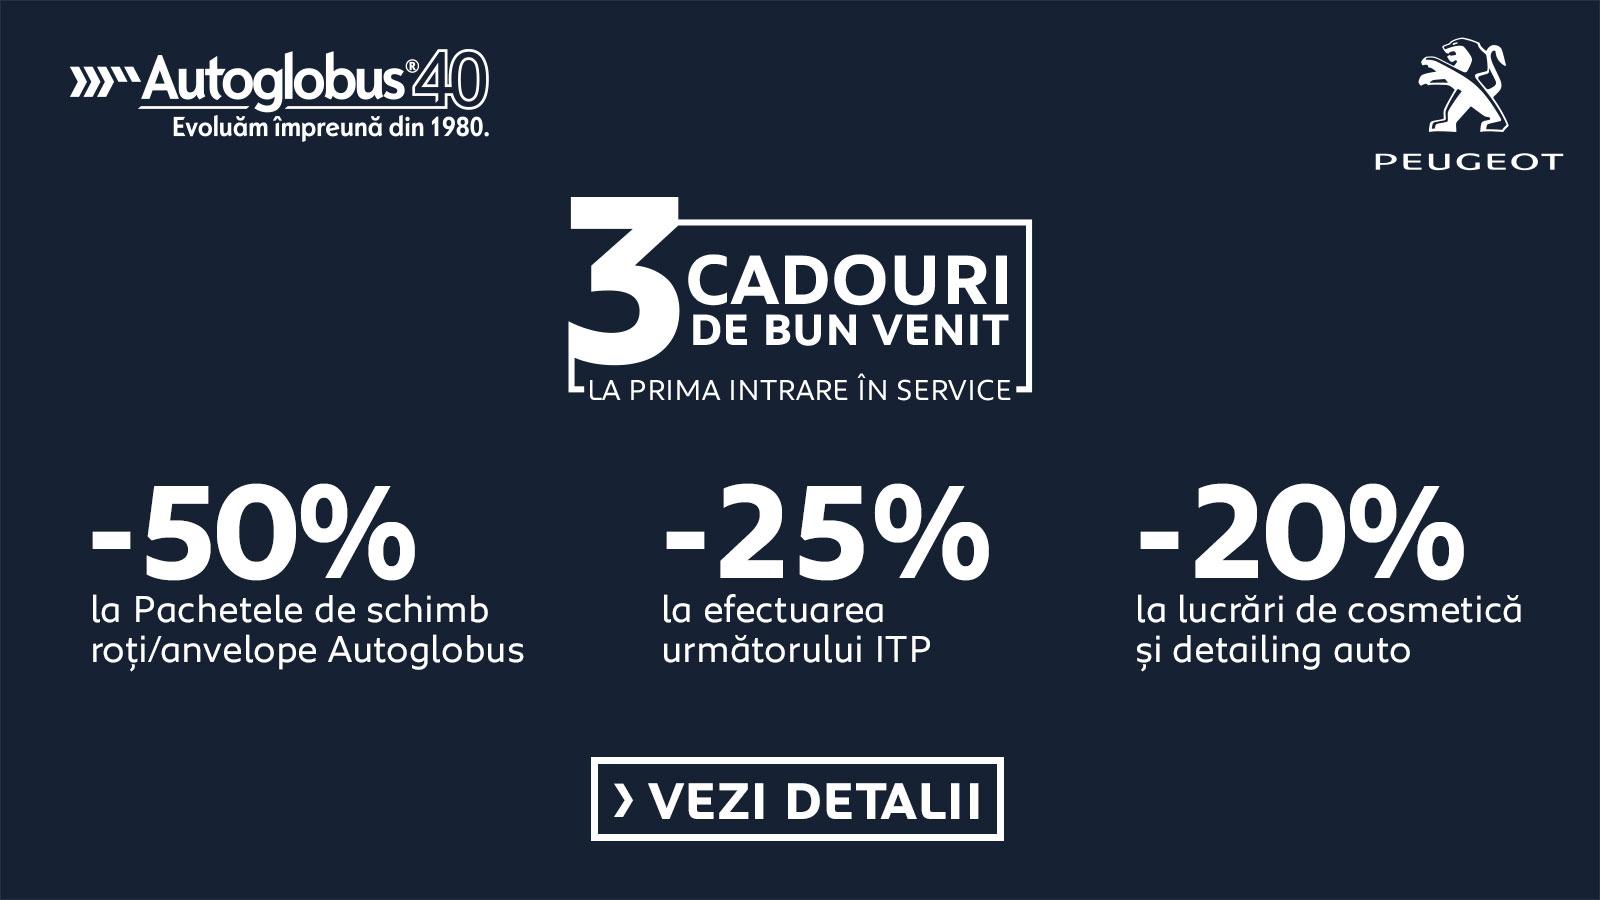 Autoglobus - Reparator Agreat Peugeot